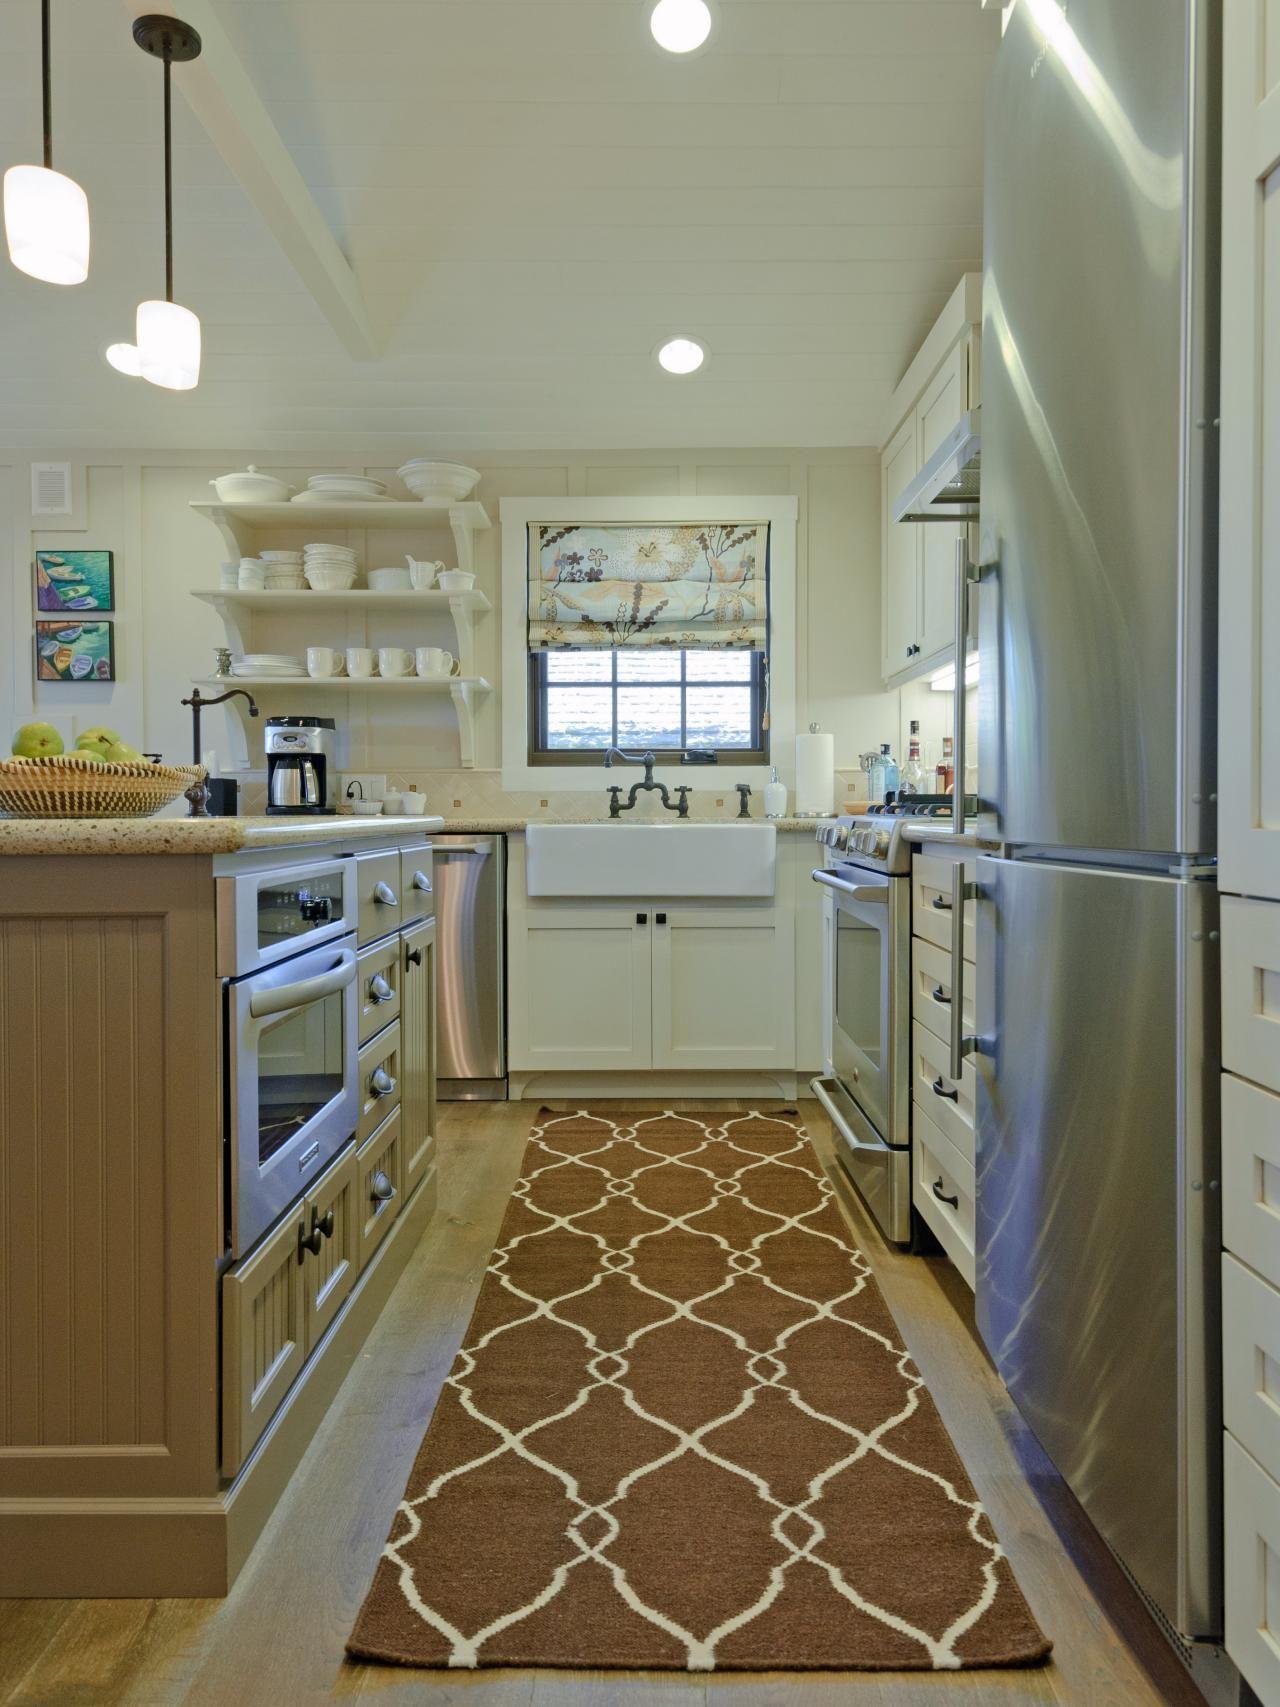 Coastal Kitchen Design Interior coastal kitchen and dining room pictures | open shelving, modern